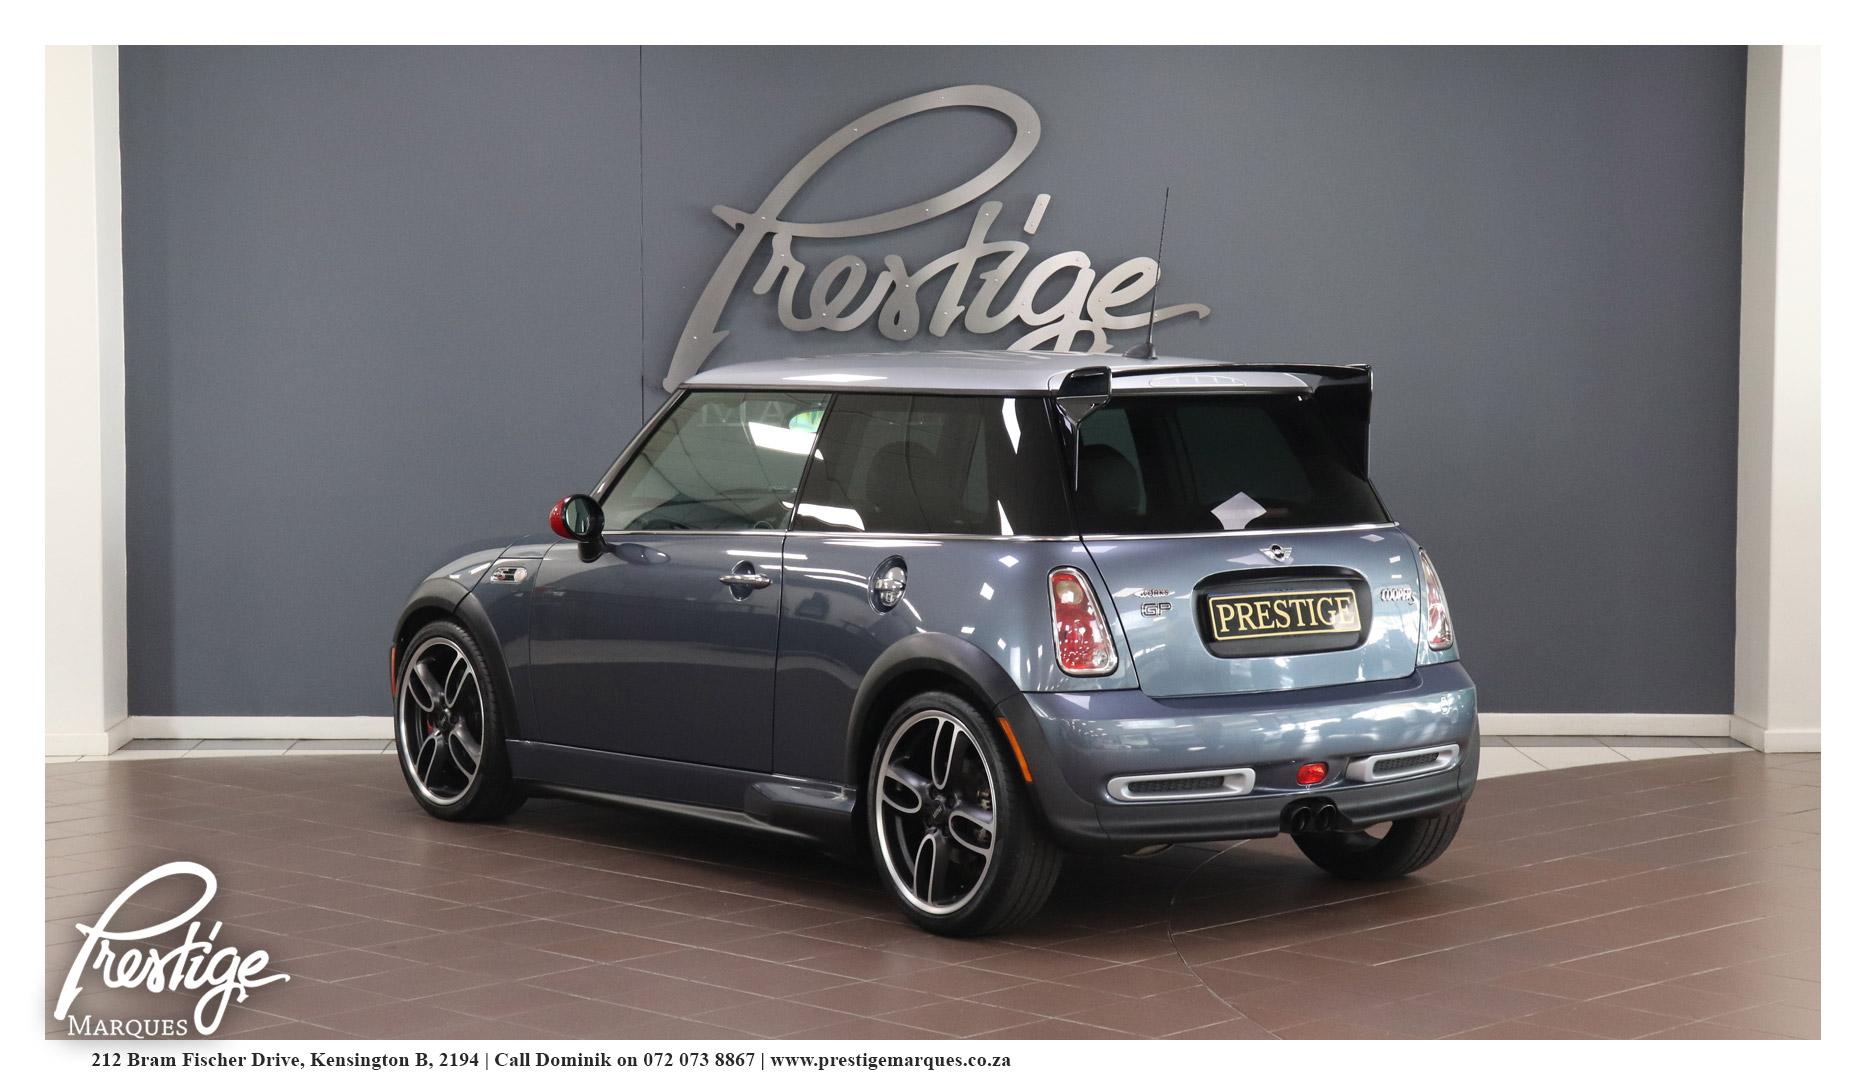 2006-Mini-Cooper-S-GP-Johon-Cooper-Works- Prestige-Marques-Randburg-Sandton-6